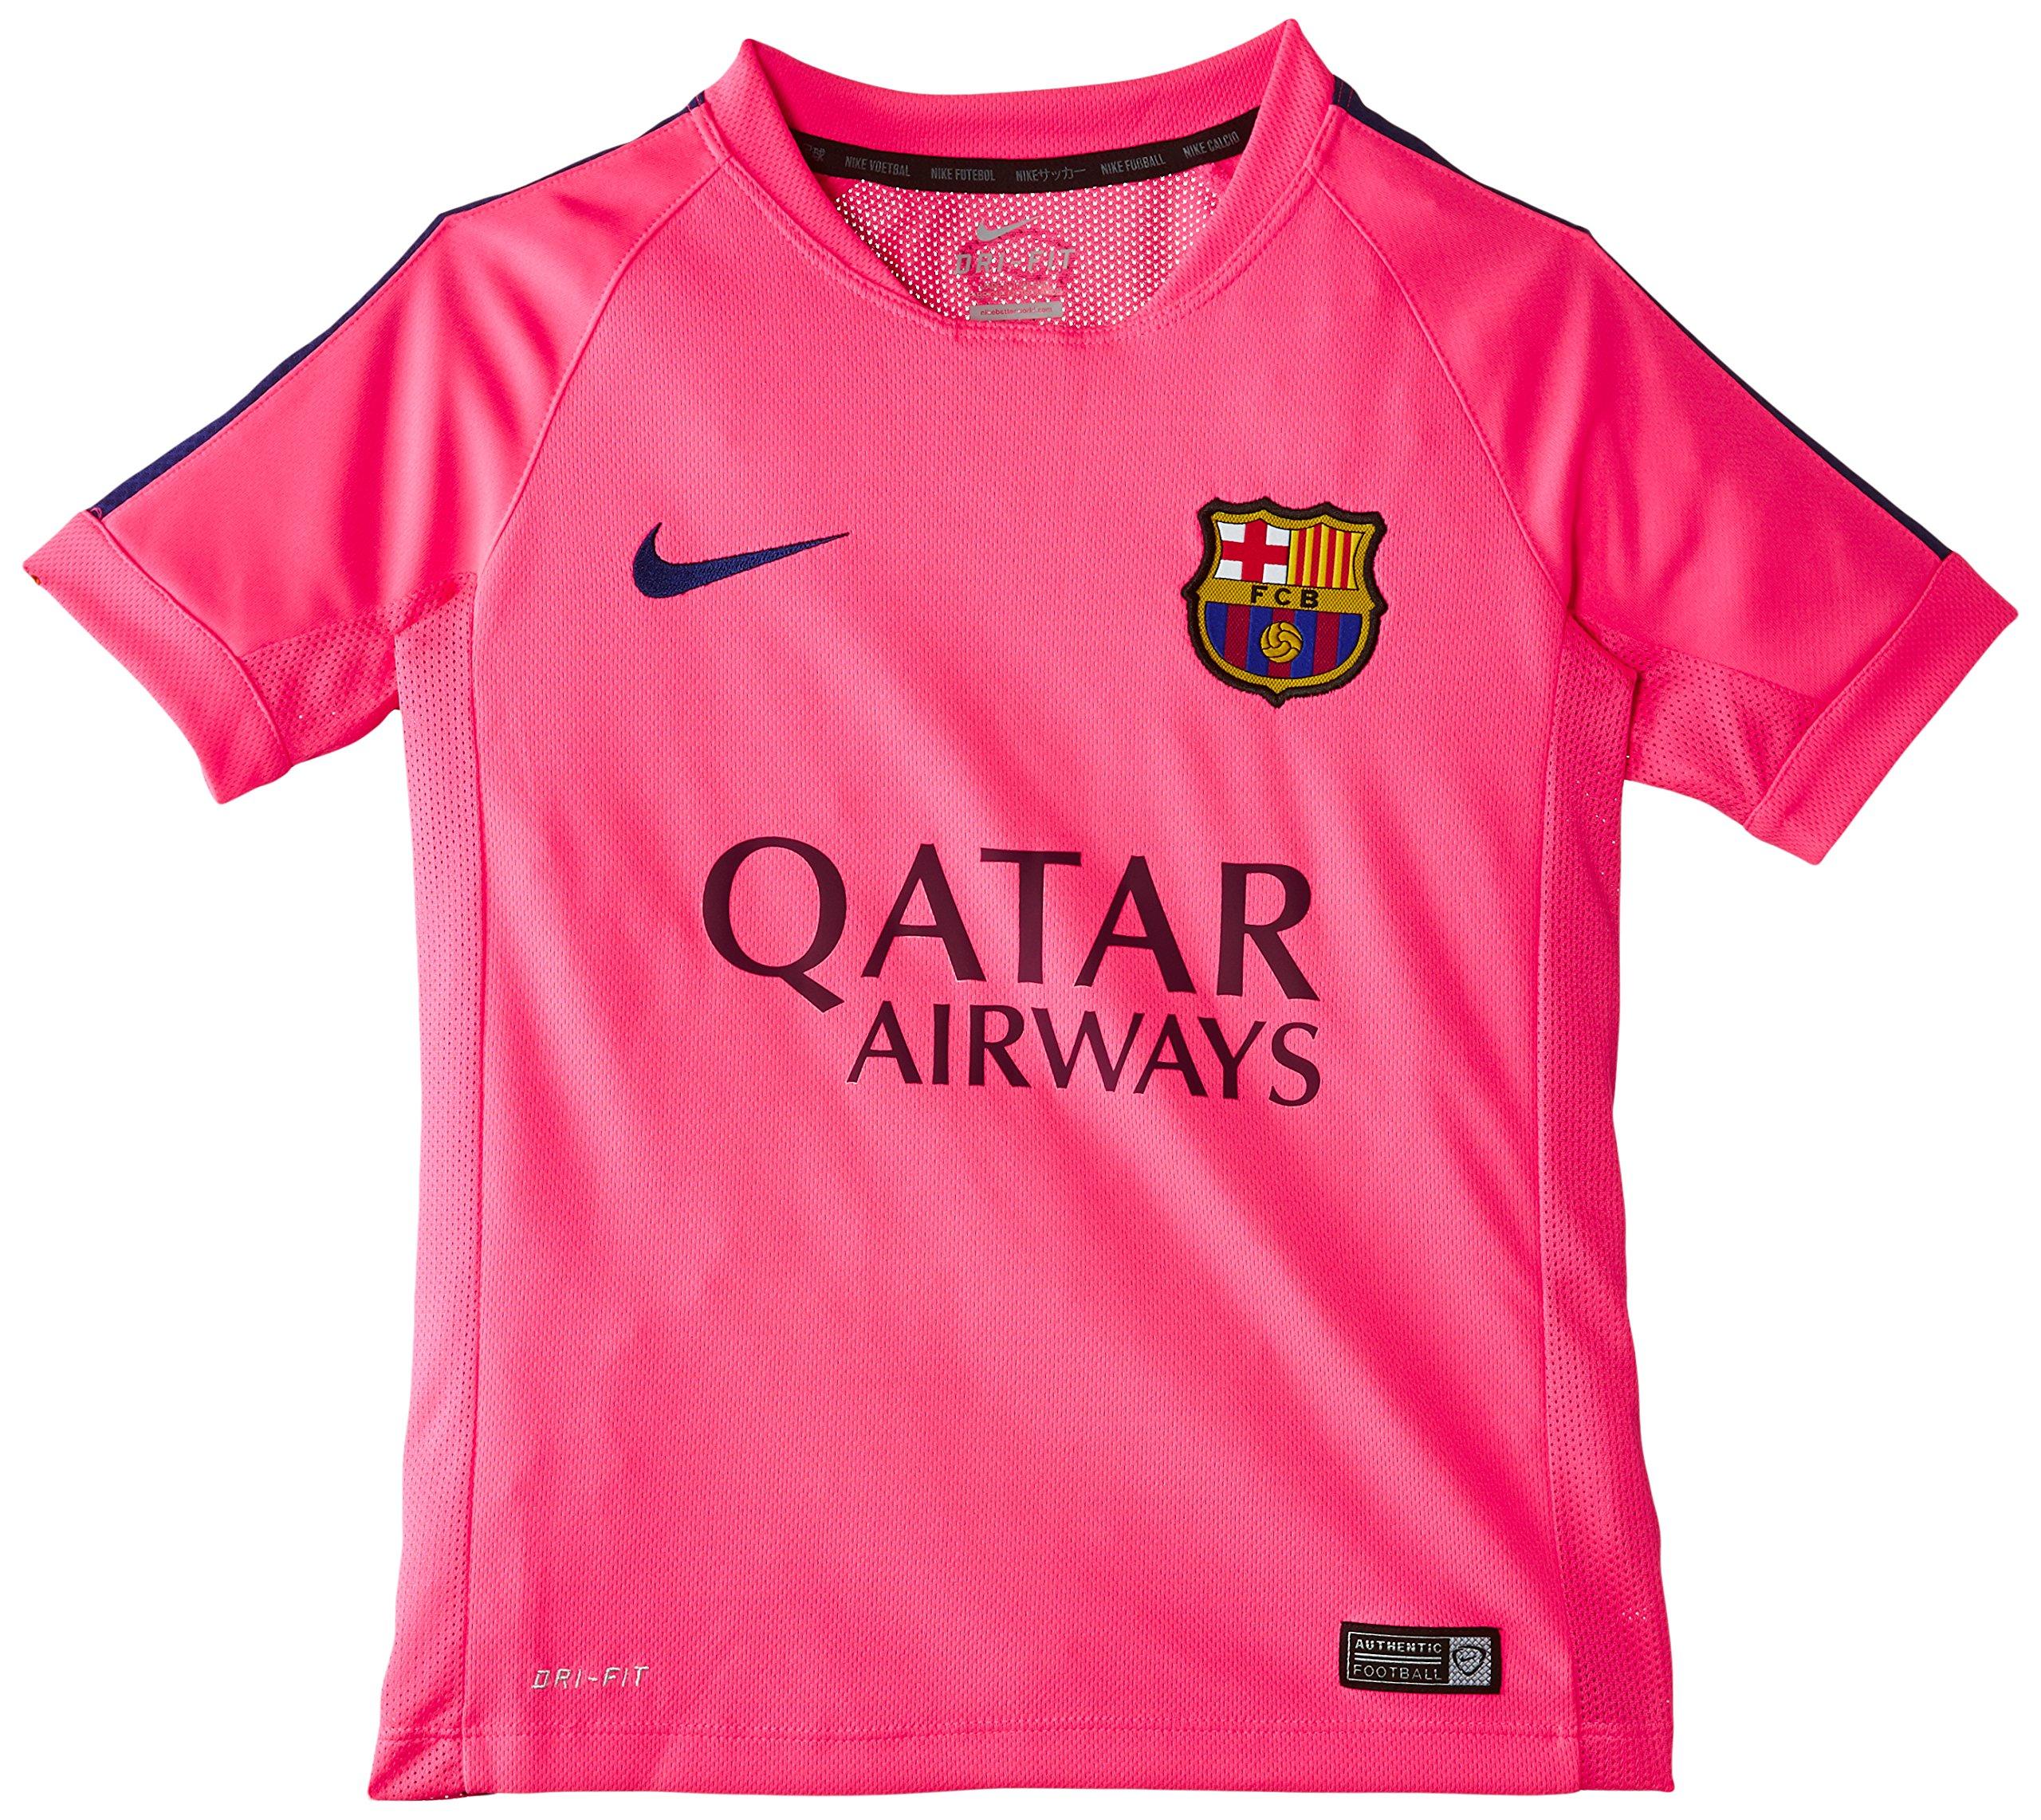 detailed look 33049 55773 Galleon - 2014-2015 Barcelona Nike Training Shirt (Pink) - Kids